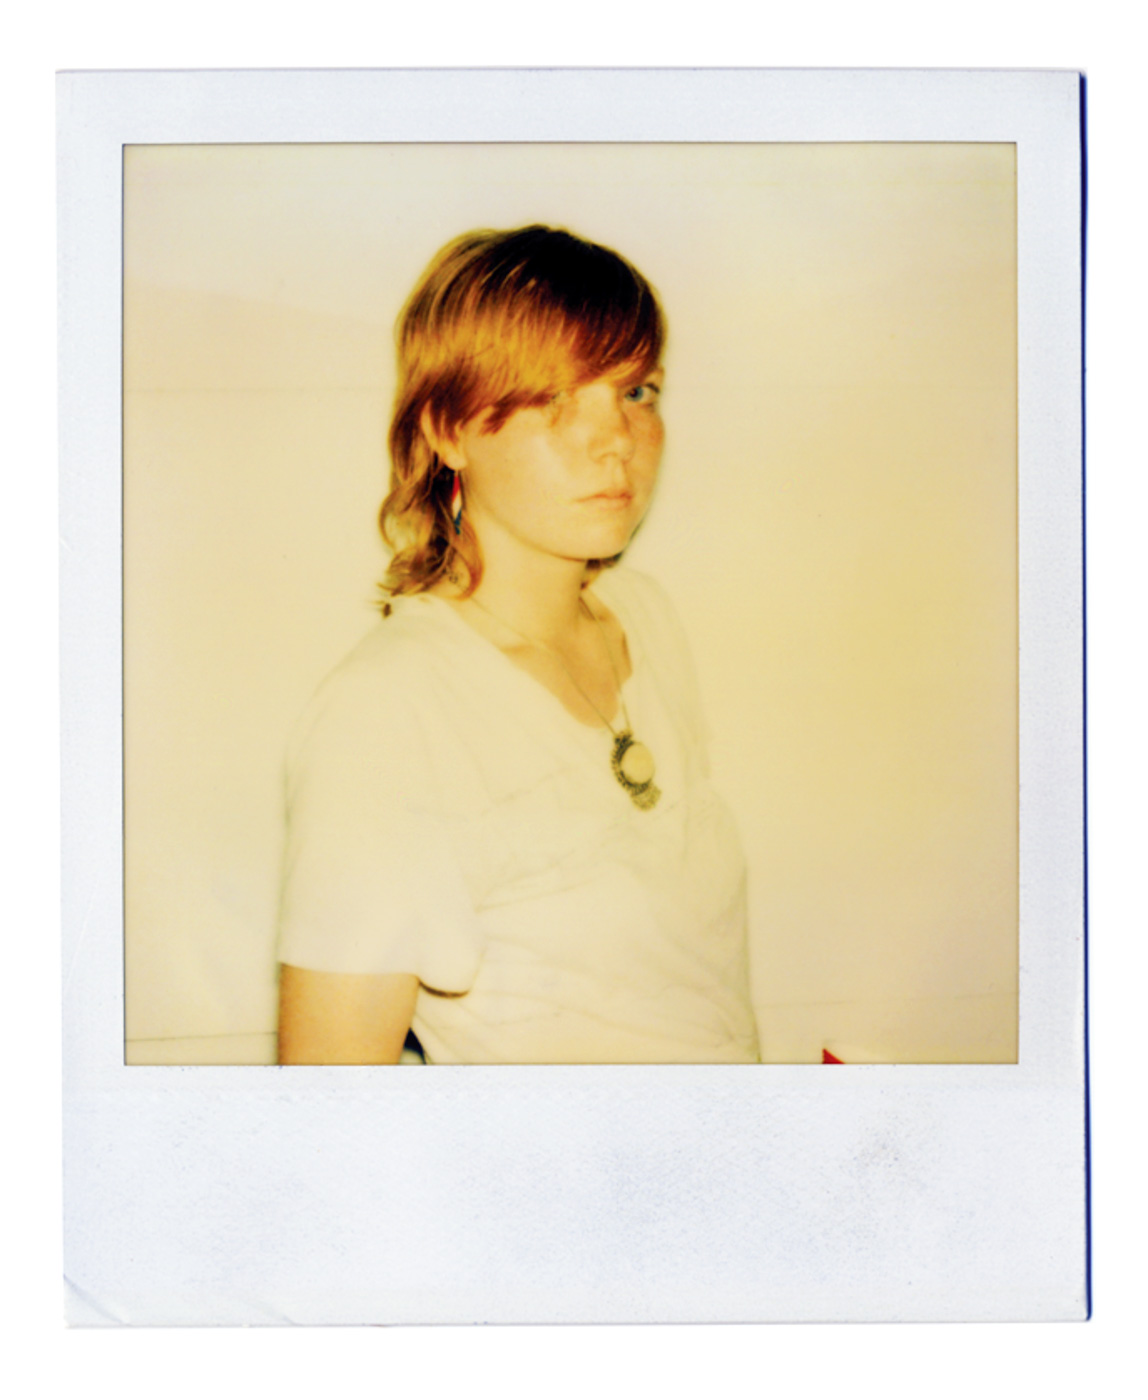 Lizzy June 23, 2002